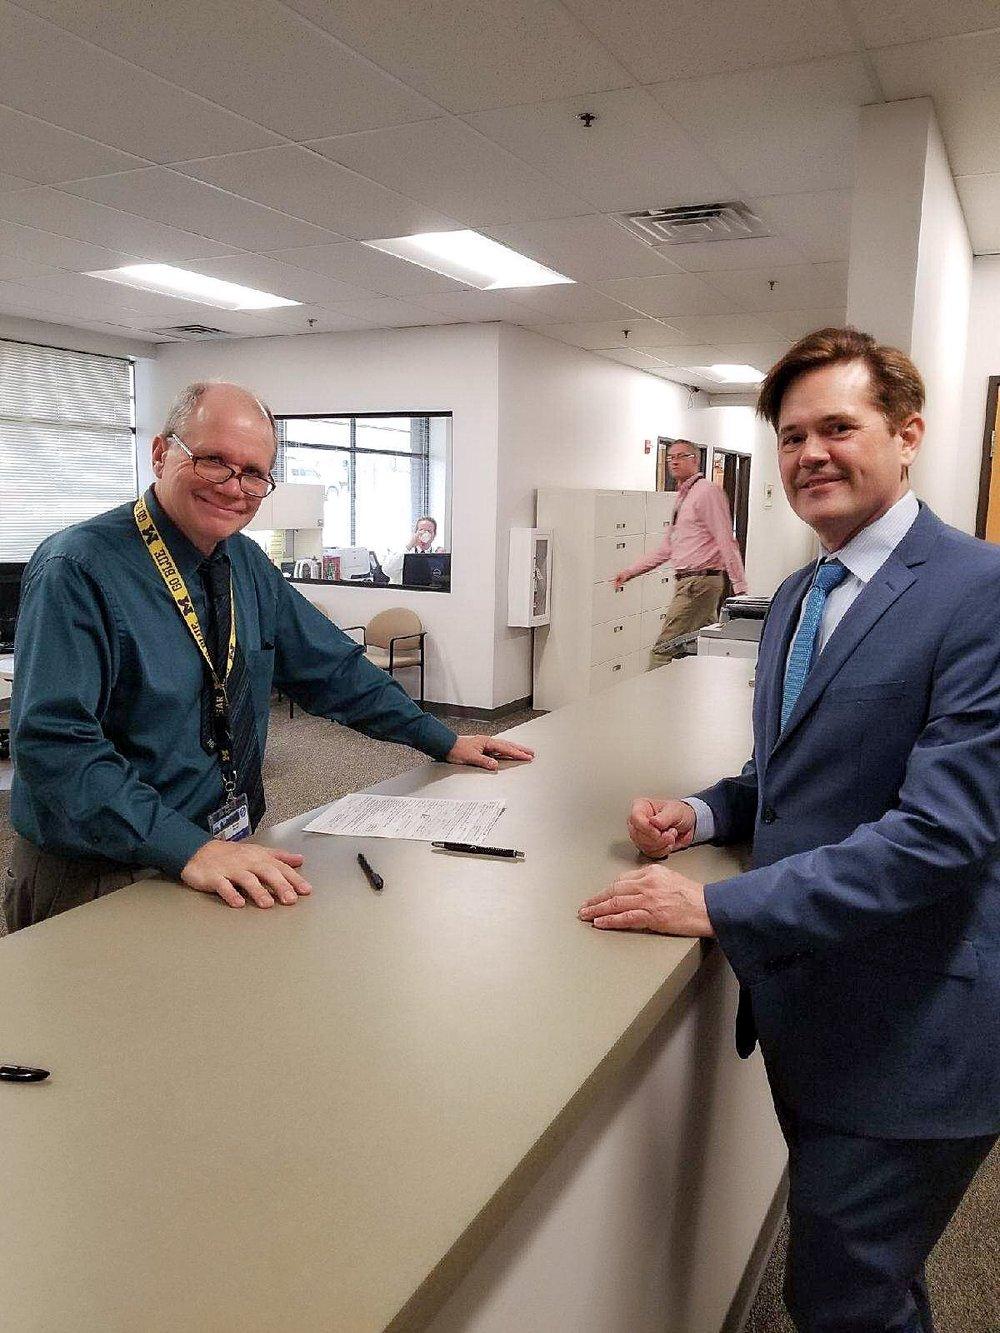 Steve Bieda filing for Macomb County Clerk today.